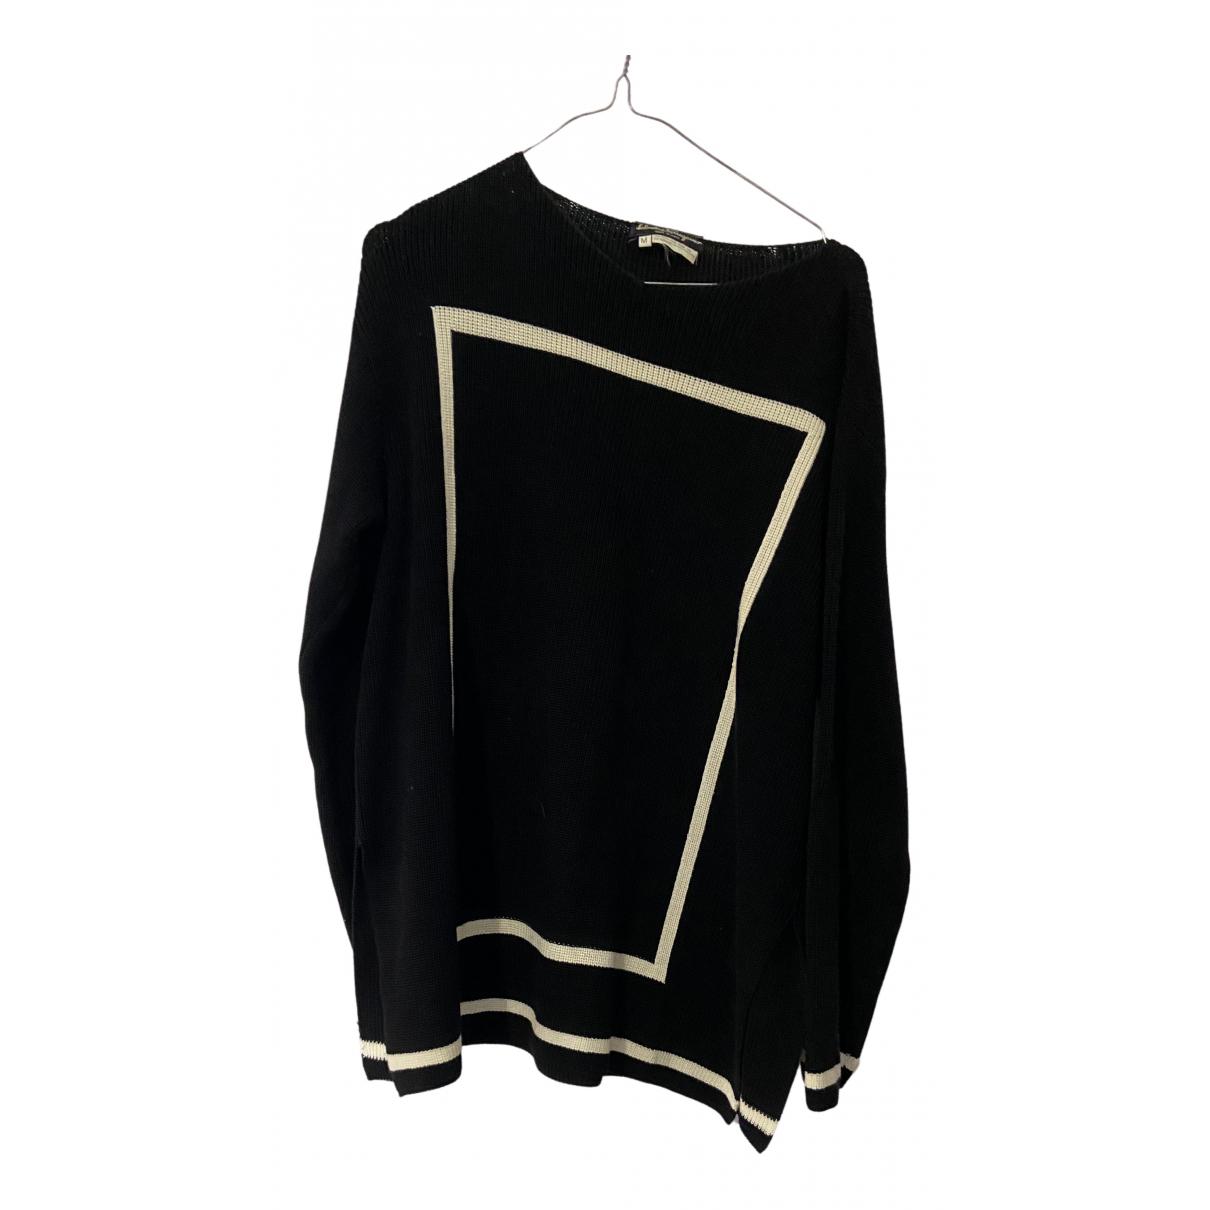 Salvatore Ferragamo N Black Cotton Knitwear for Women M International